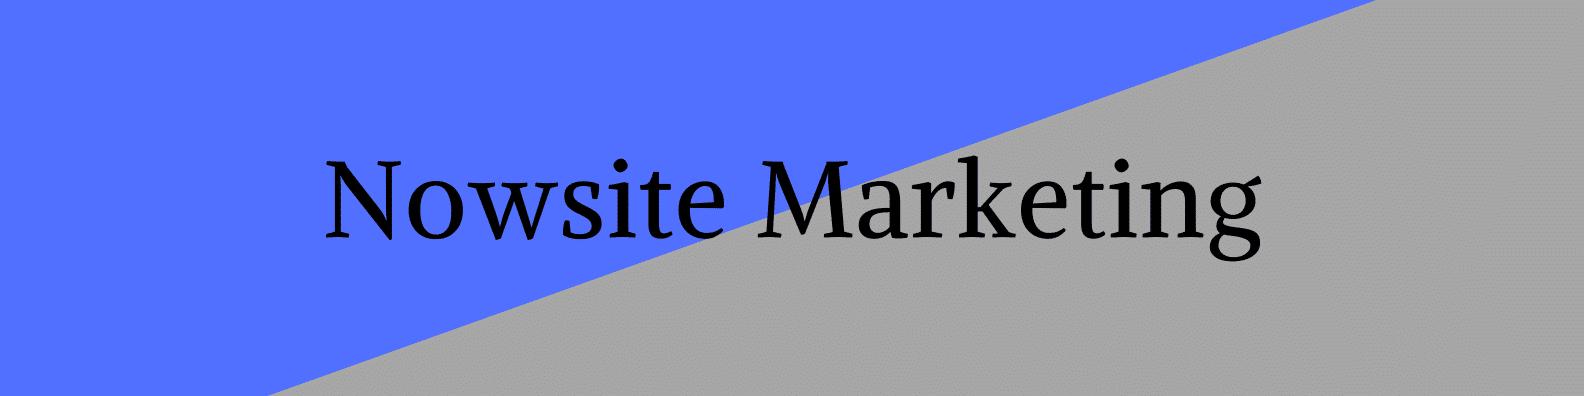 Titre Nowsite marketing